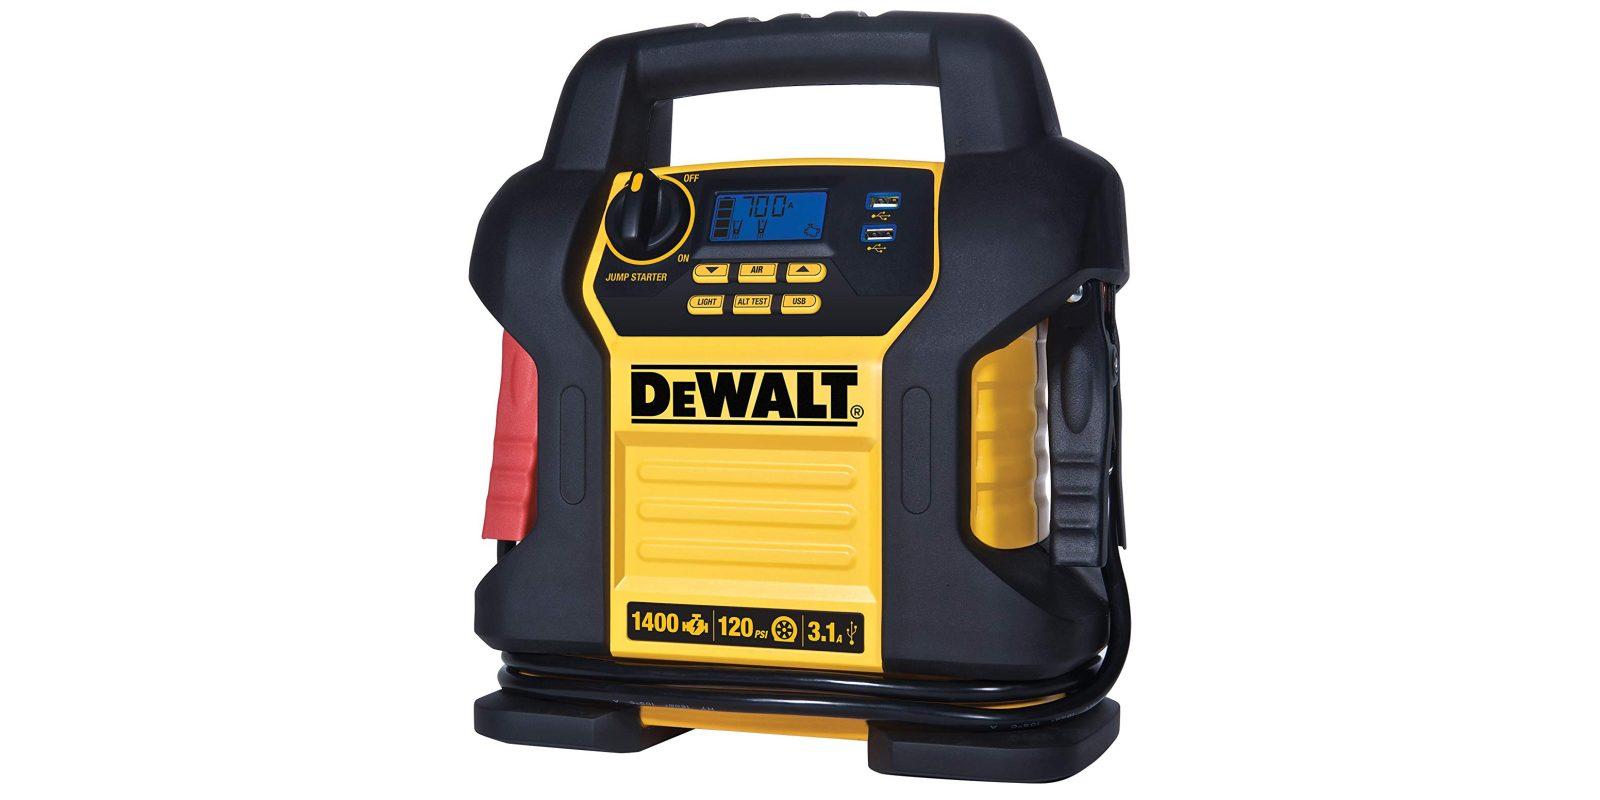 Dewalt S Combination Jump Starter Amp Air Compressor Has Usb Ports Now 122 Reg 155 9to5toys